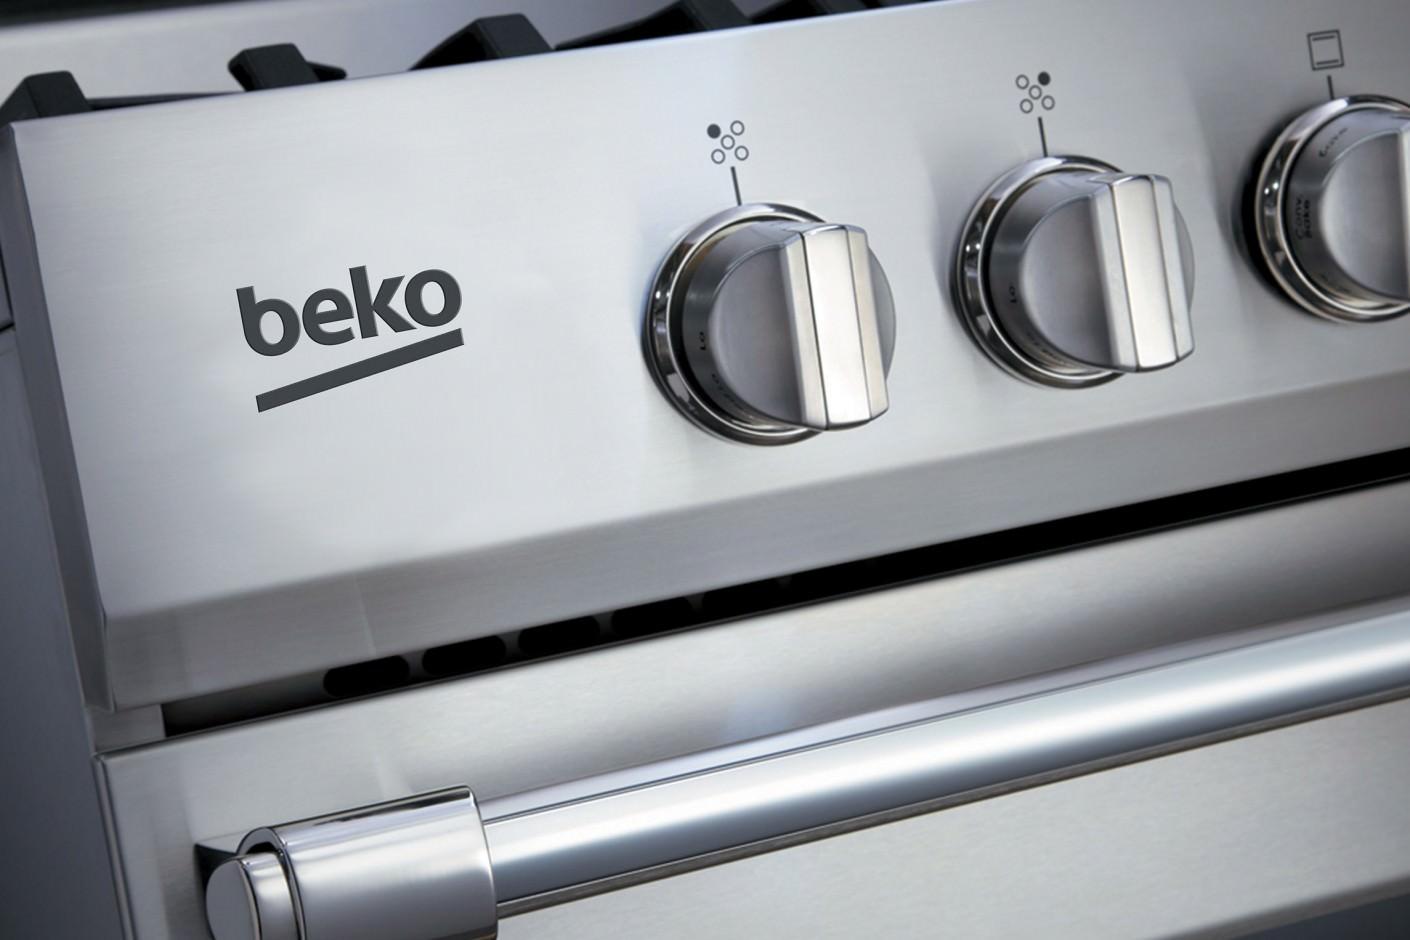 Beko photo